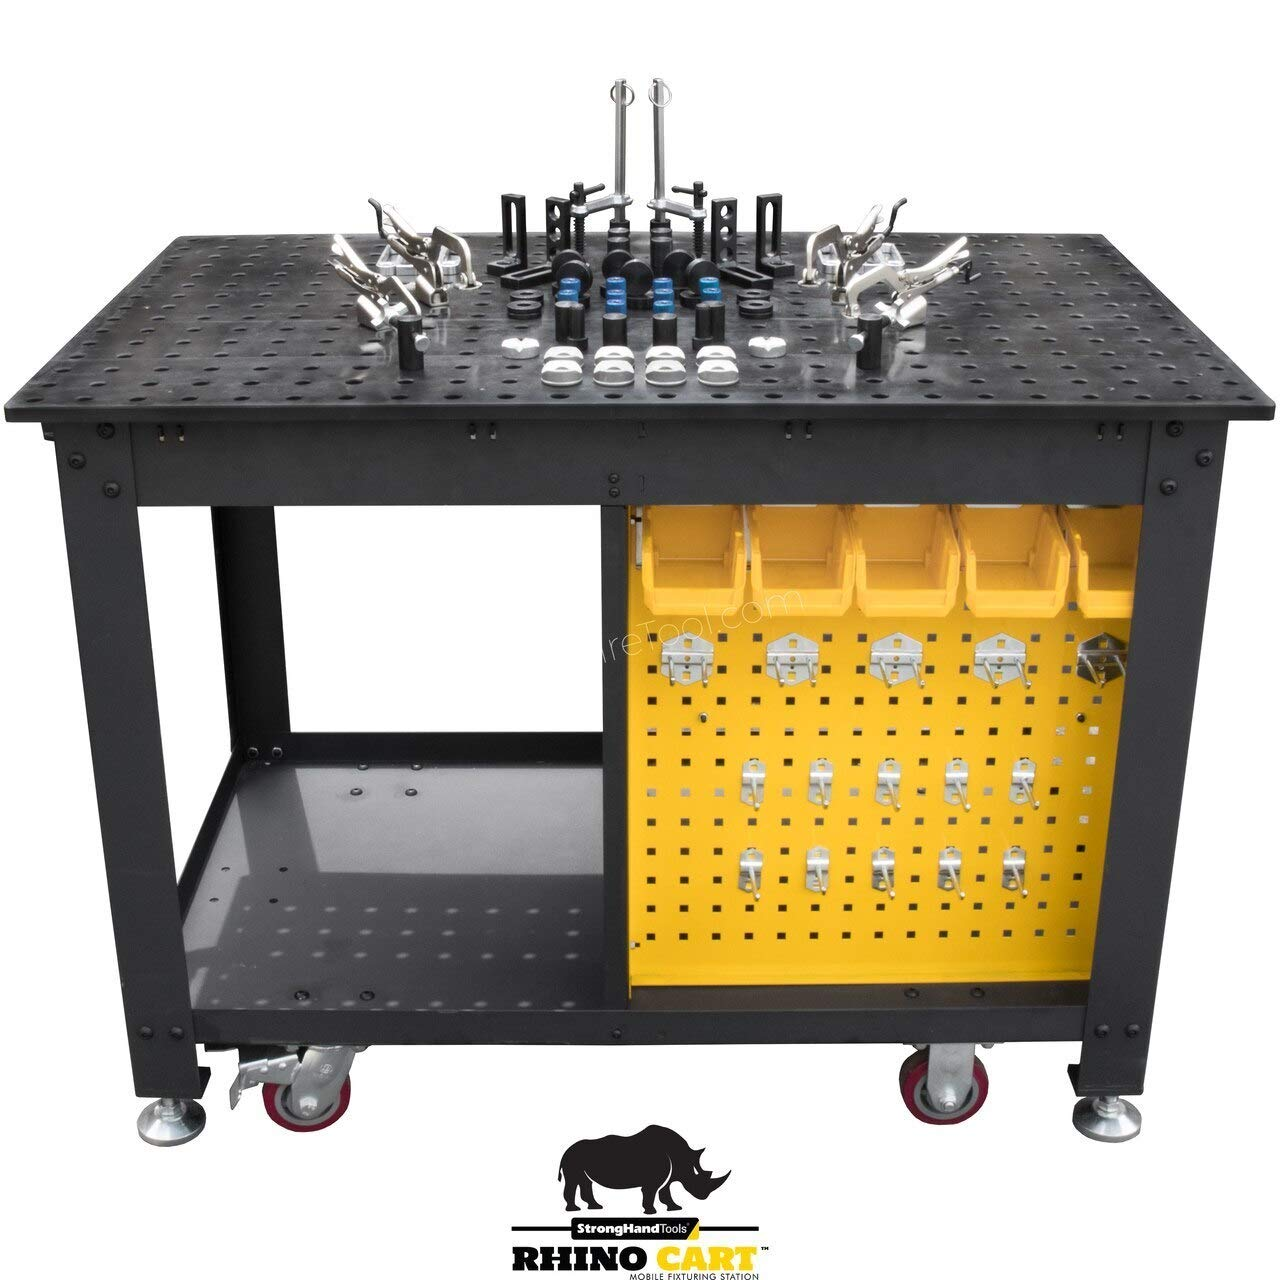 Rhino Cart (Table + 66 pc. Fixture Kit):